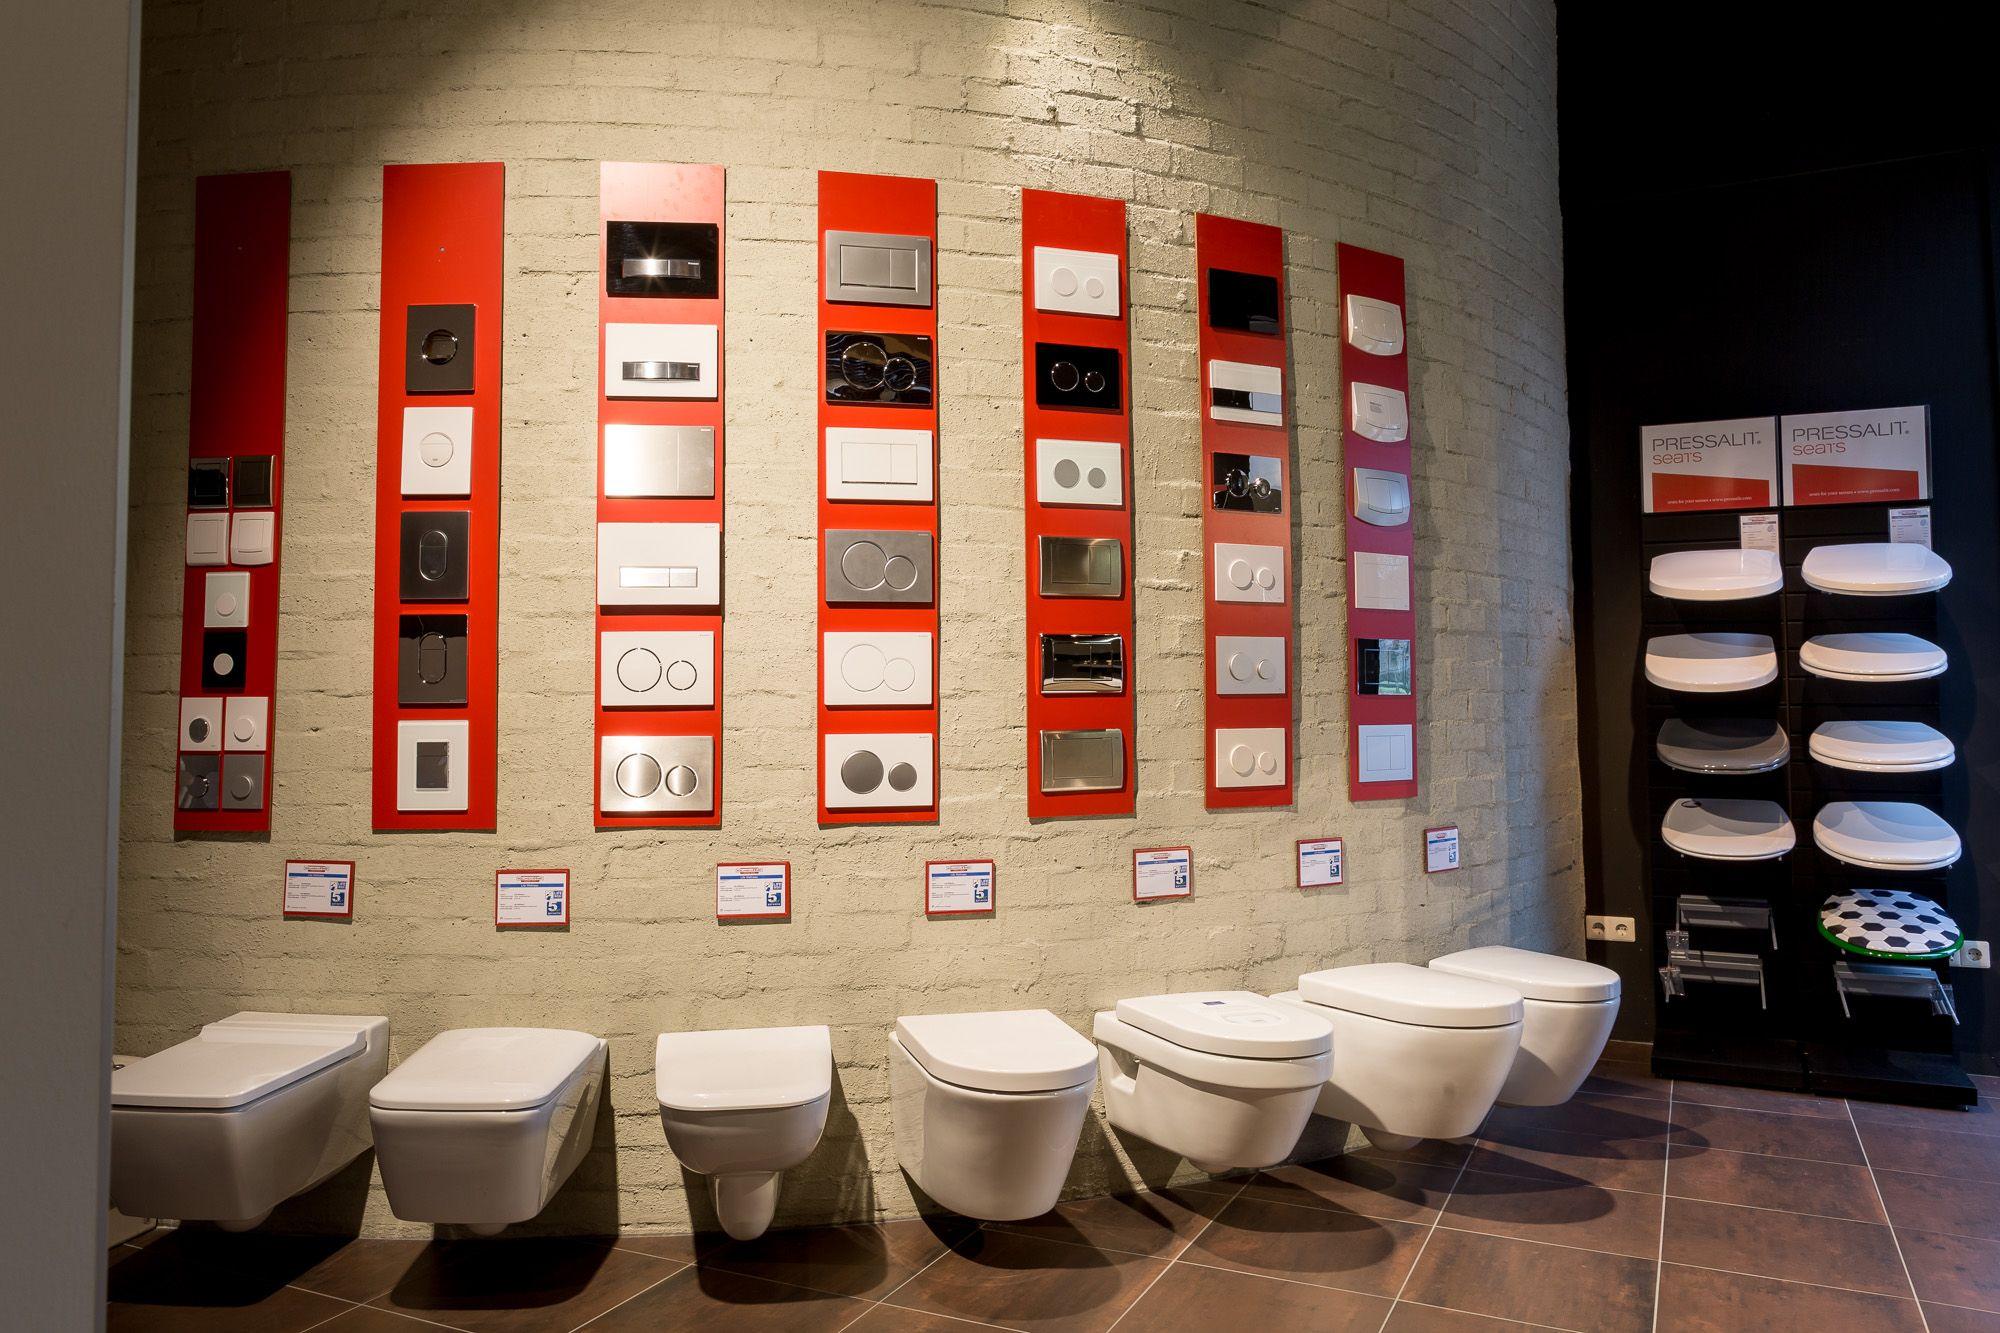 Concordia Keuken&Bad | Sanitair | Badkamers | uw adres voor keukens ...